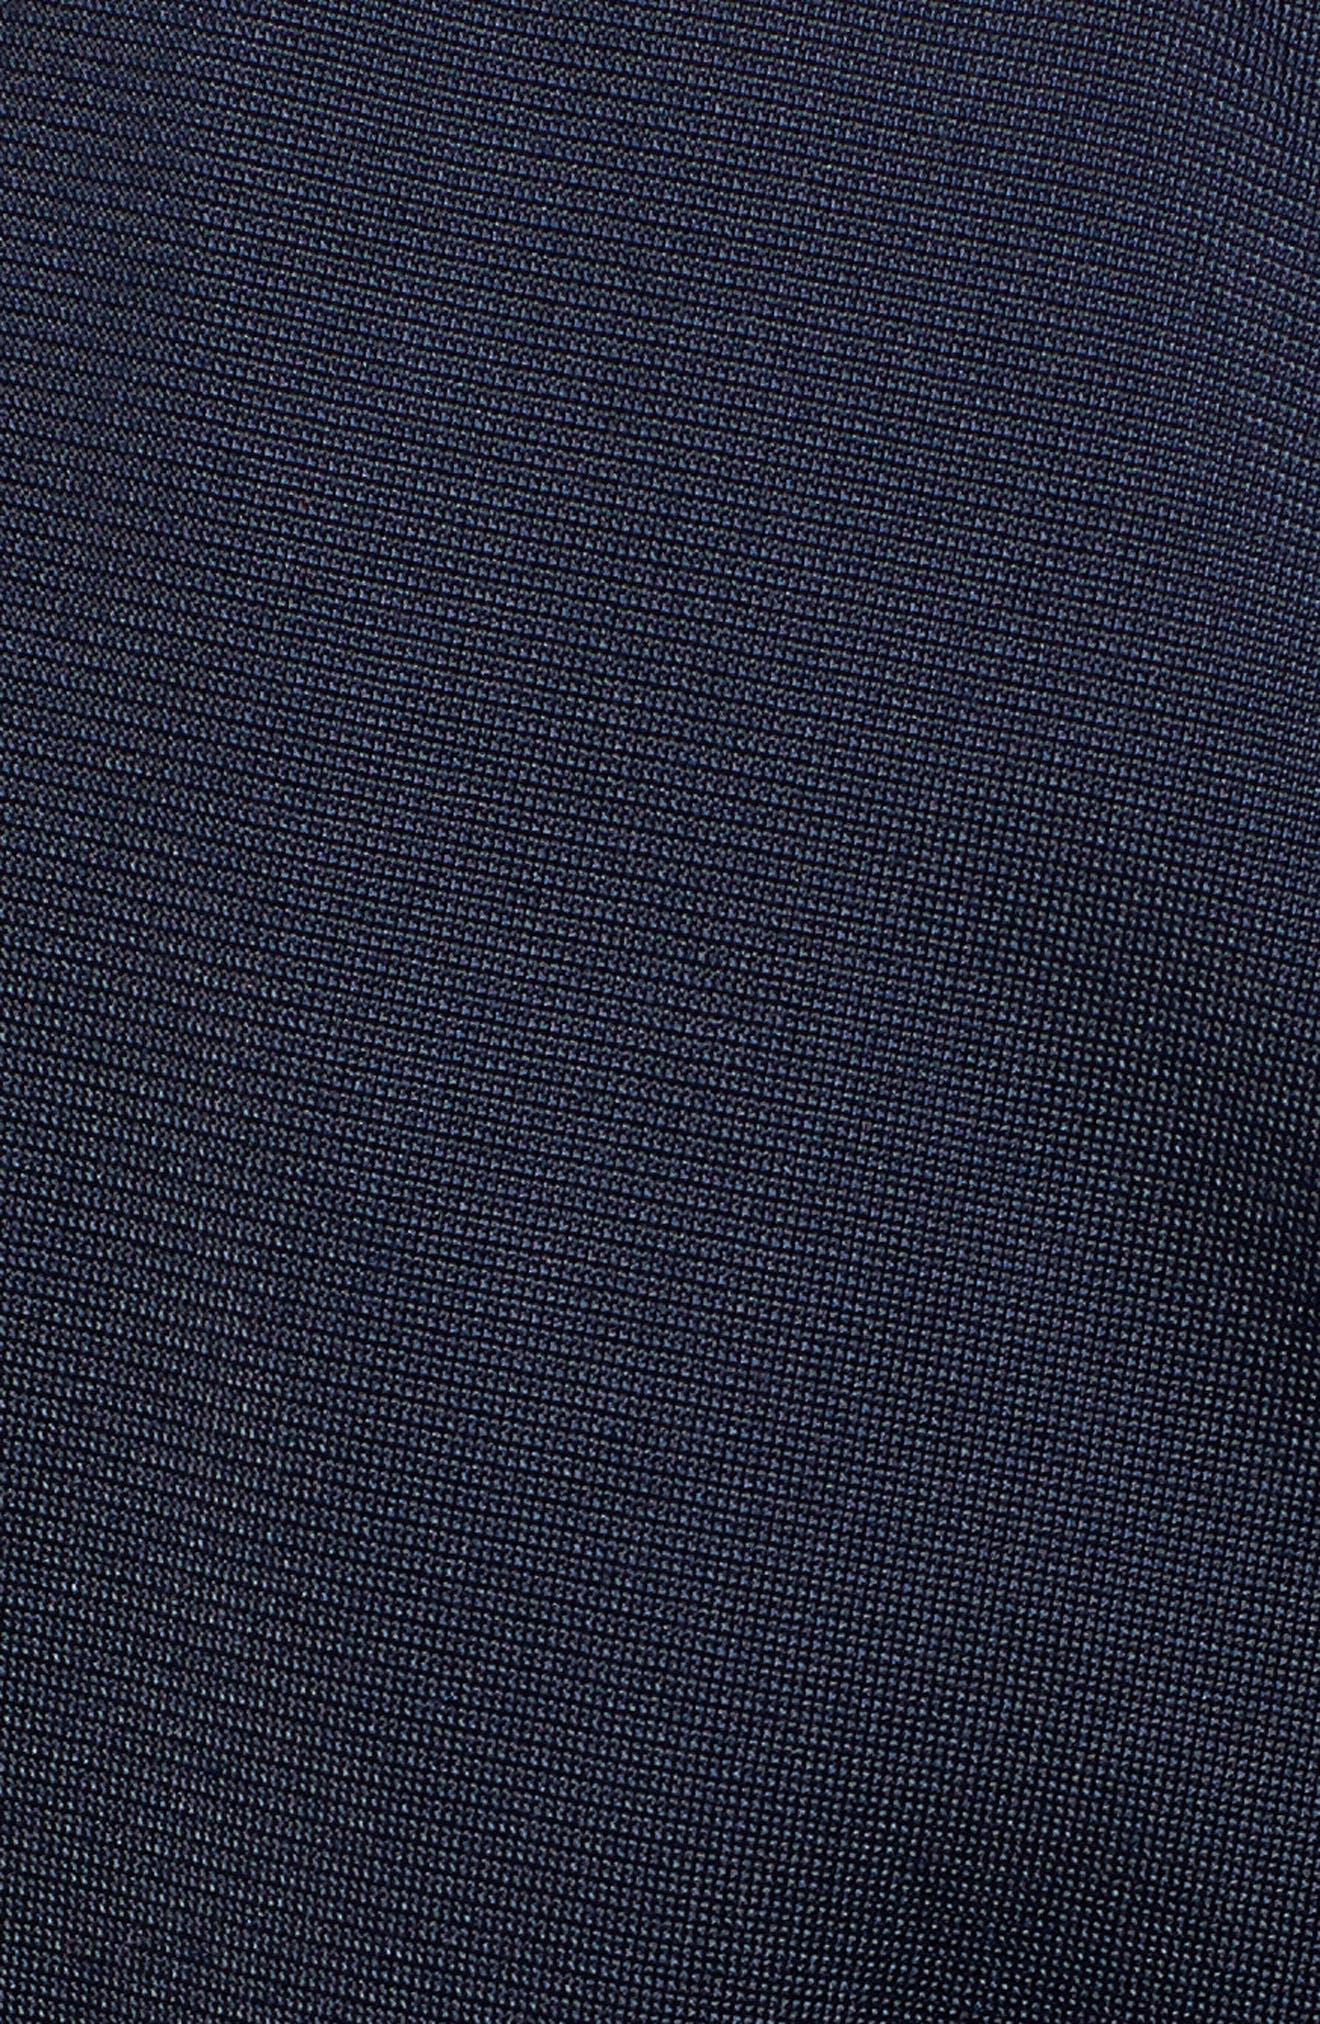 Track Pants,                             Alternate thumbnail 5, color,                             NAVY/ SCARLET